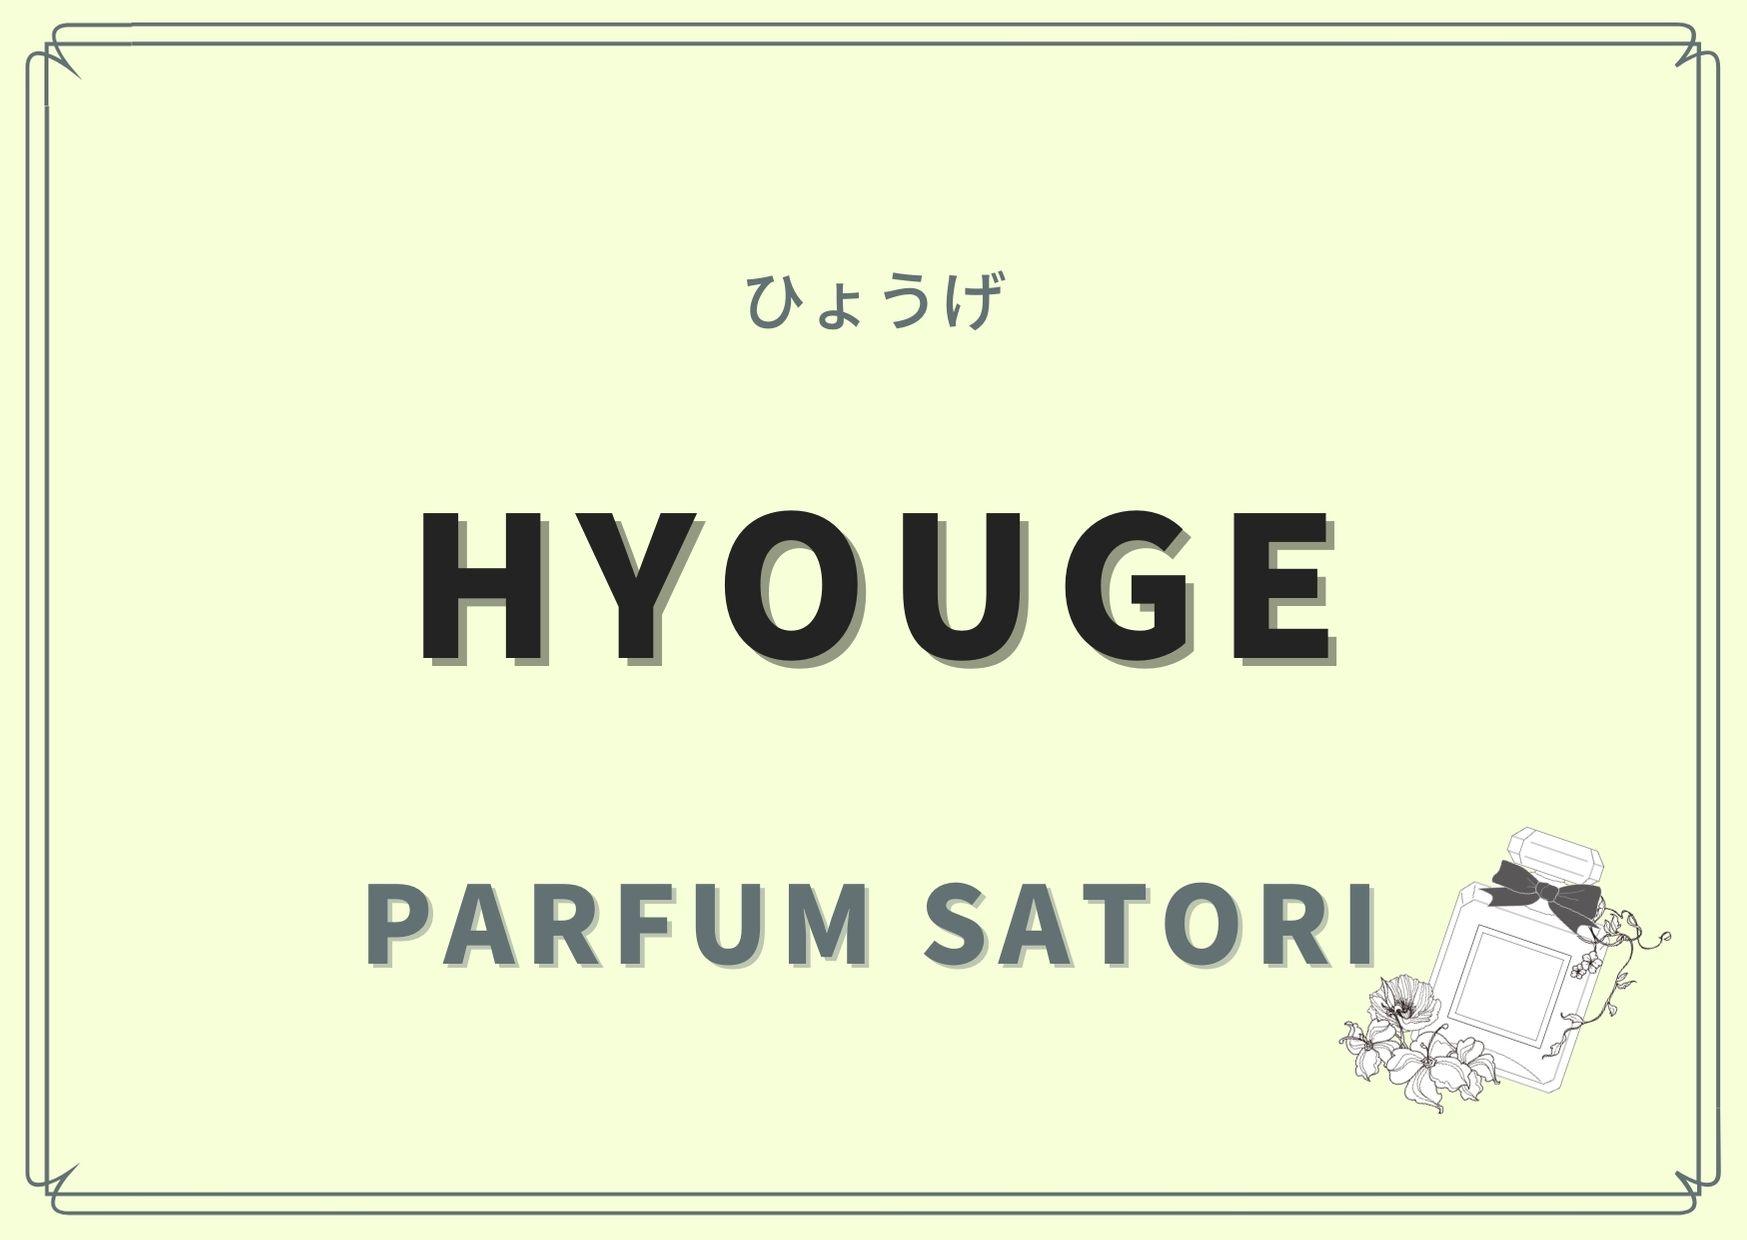 ORIBE(織部)/HYOUGE(ひょうげ)/PARFUM SATORI(パルファン サトリ)